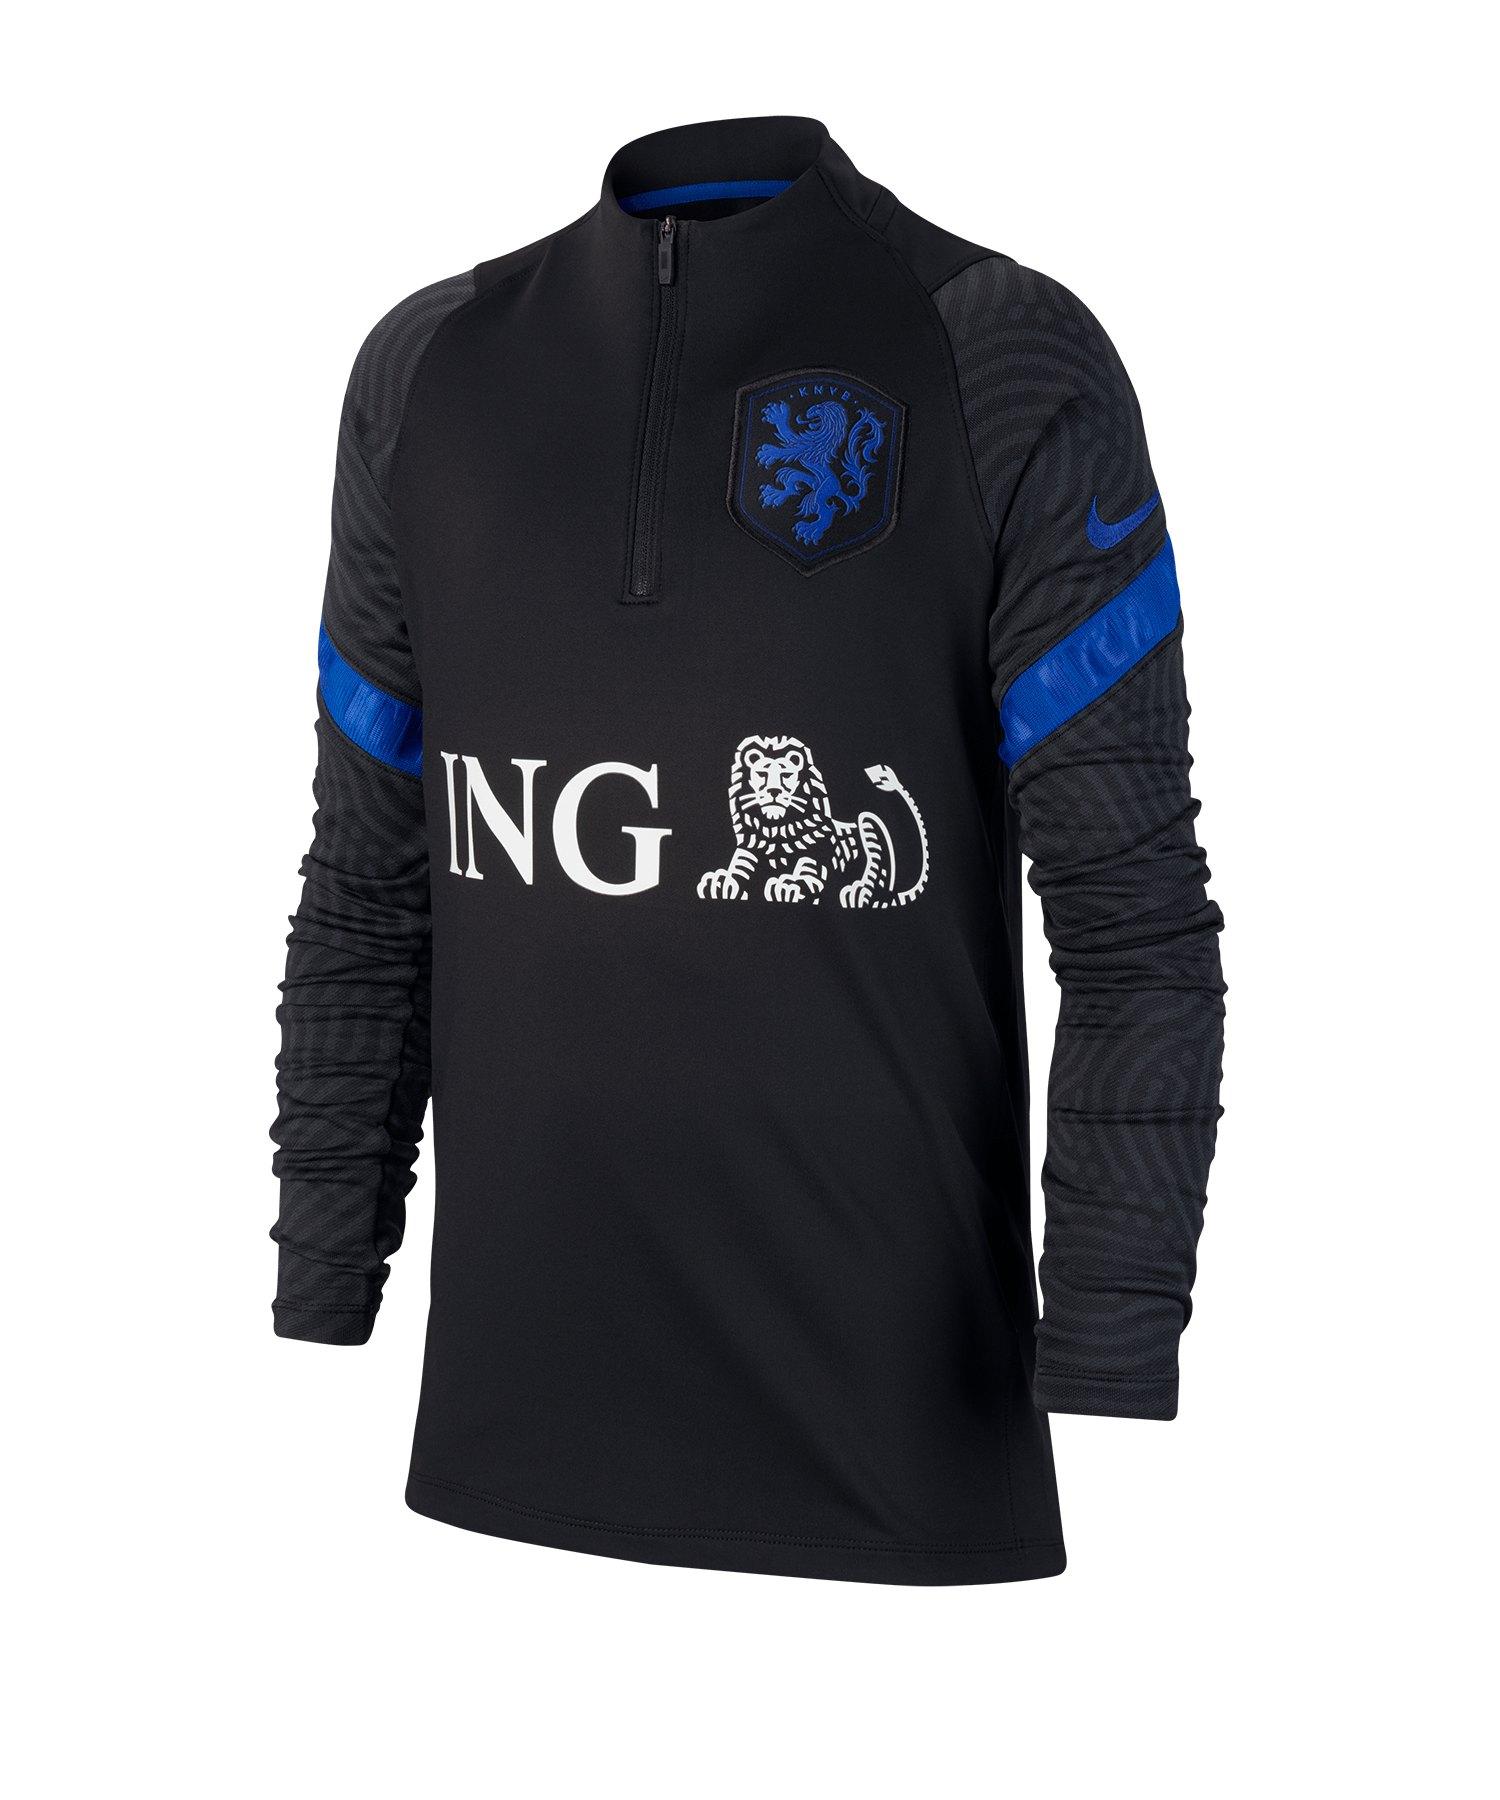 Nike Niederlande Dri-FIT 1/4 Zip Top LS Kids F011 - schwarz